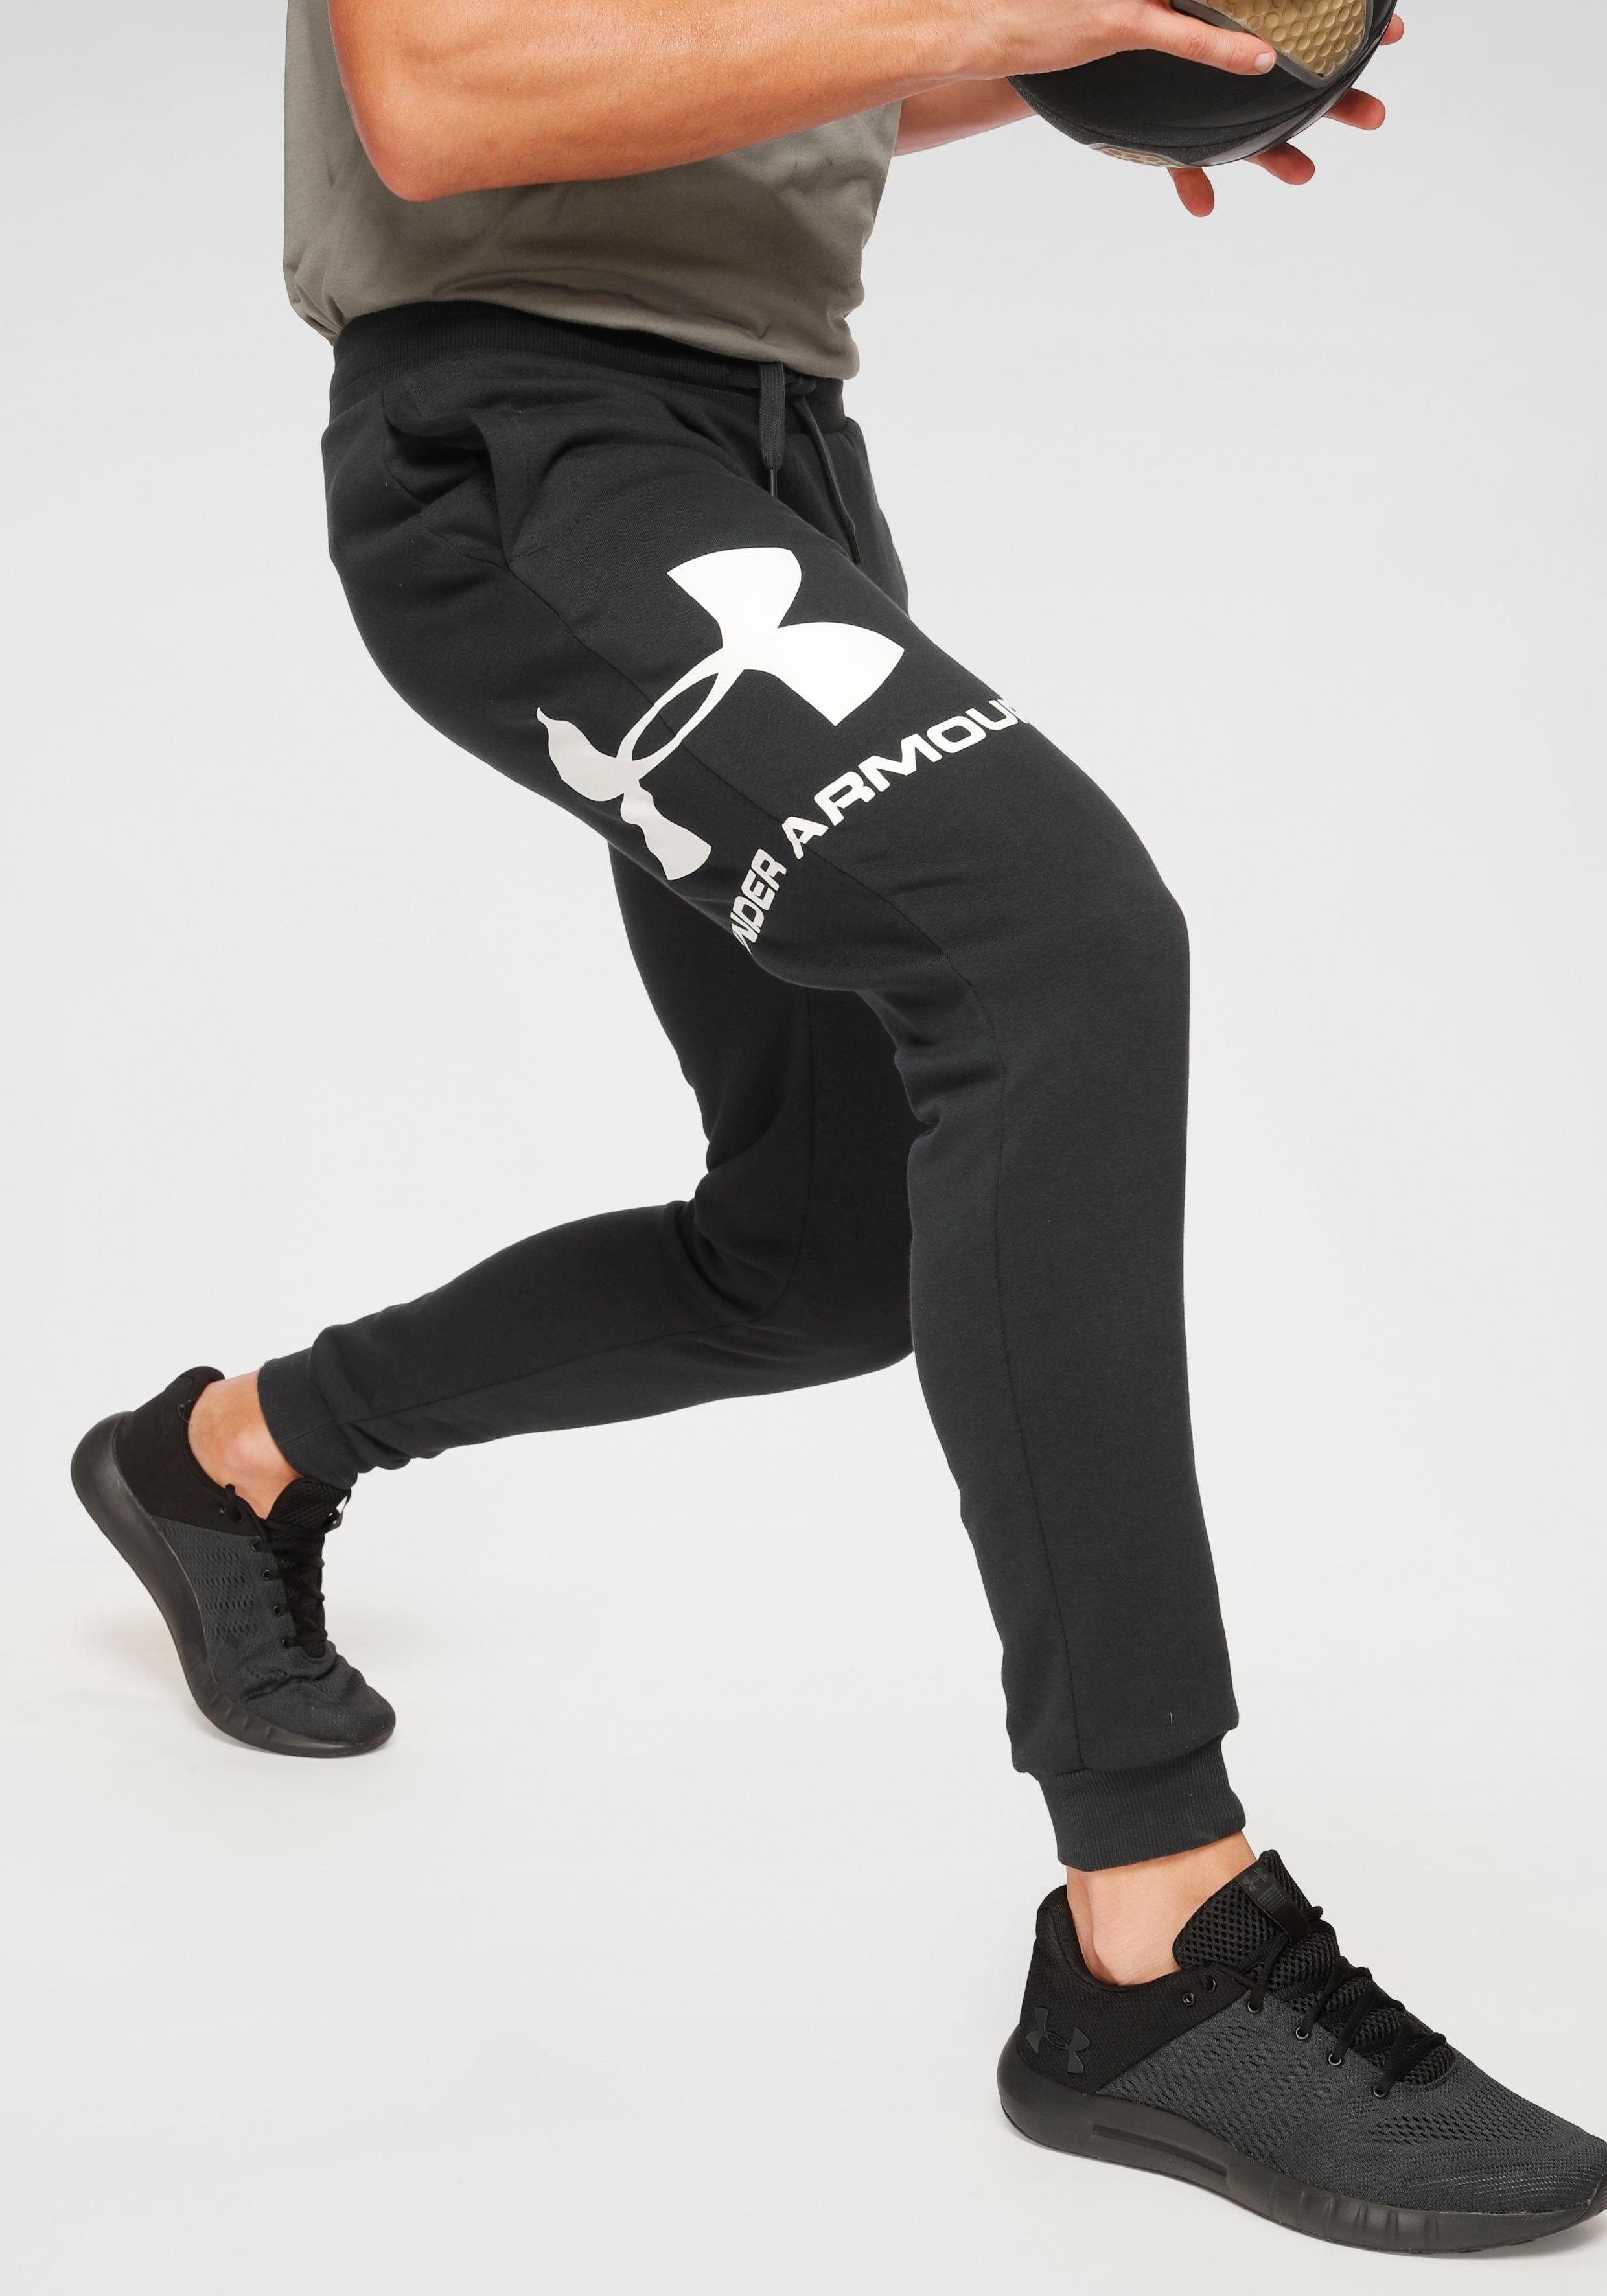 Reebok One Series WP Warm Tight Damen Leggings Hose Sporthose Fitness Jogging